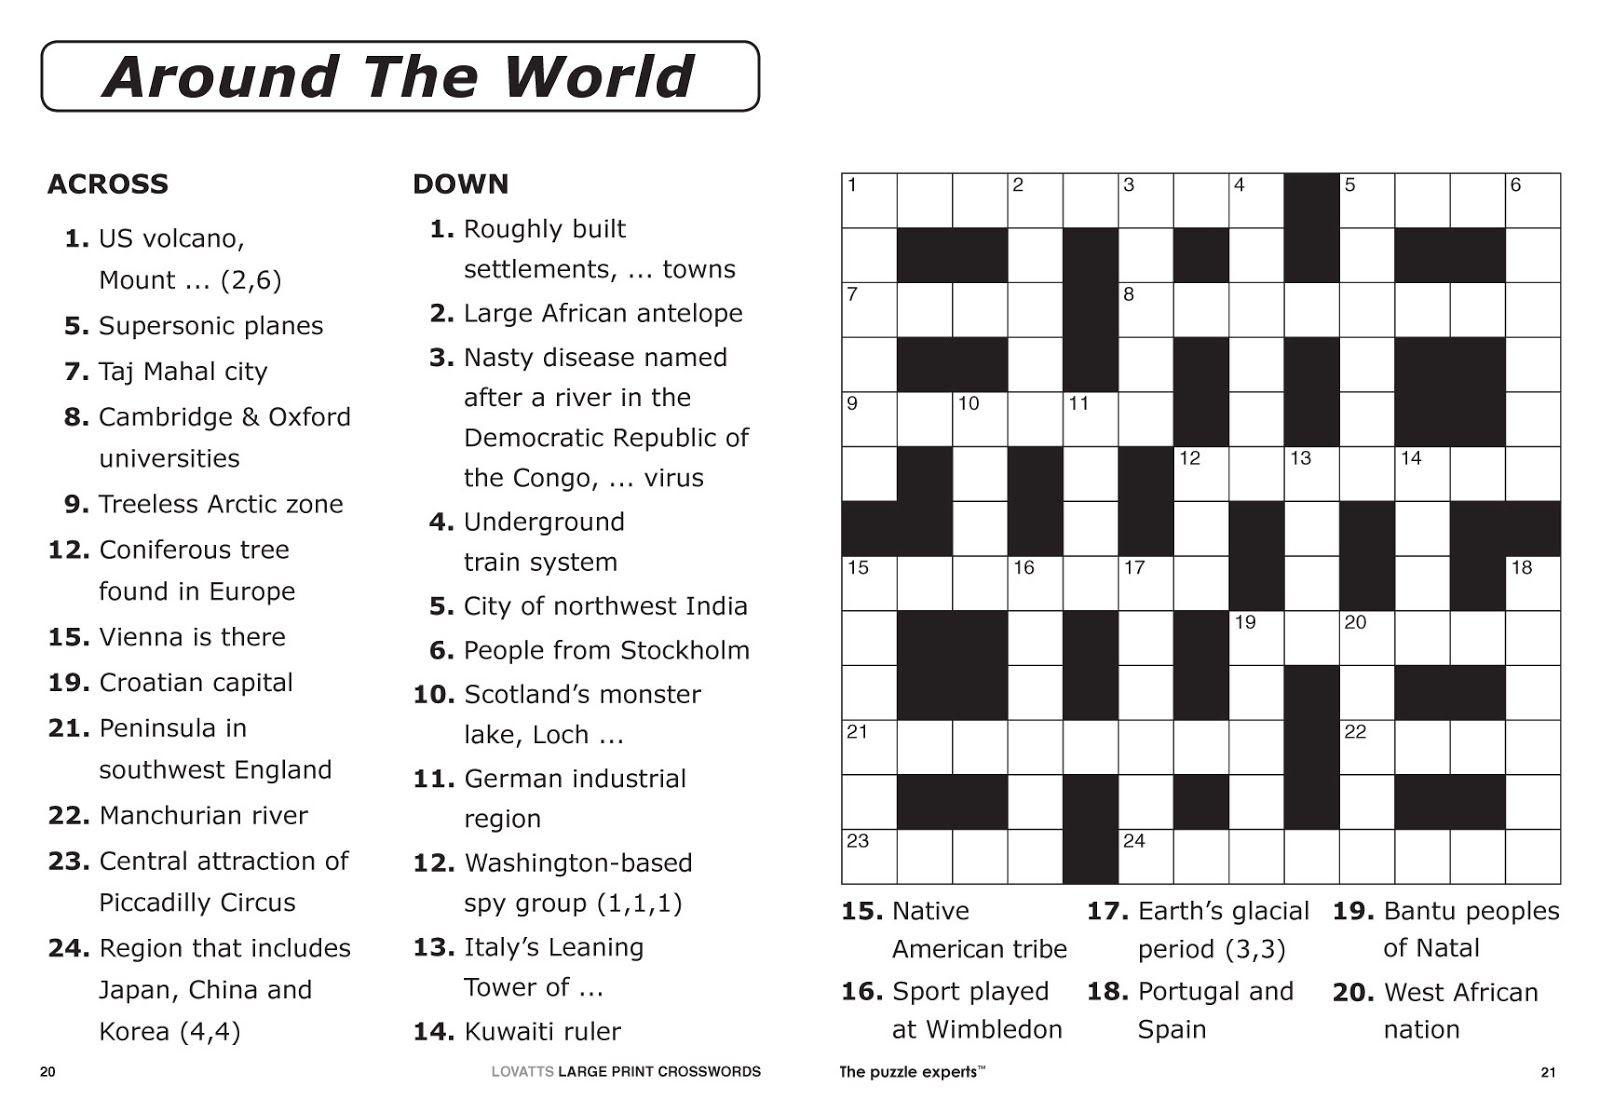 Free Printable Large Print Crossword Puzzles | M3U8 - Printable Crossword Puzzles For 10 Year Olds